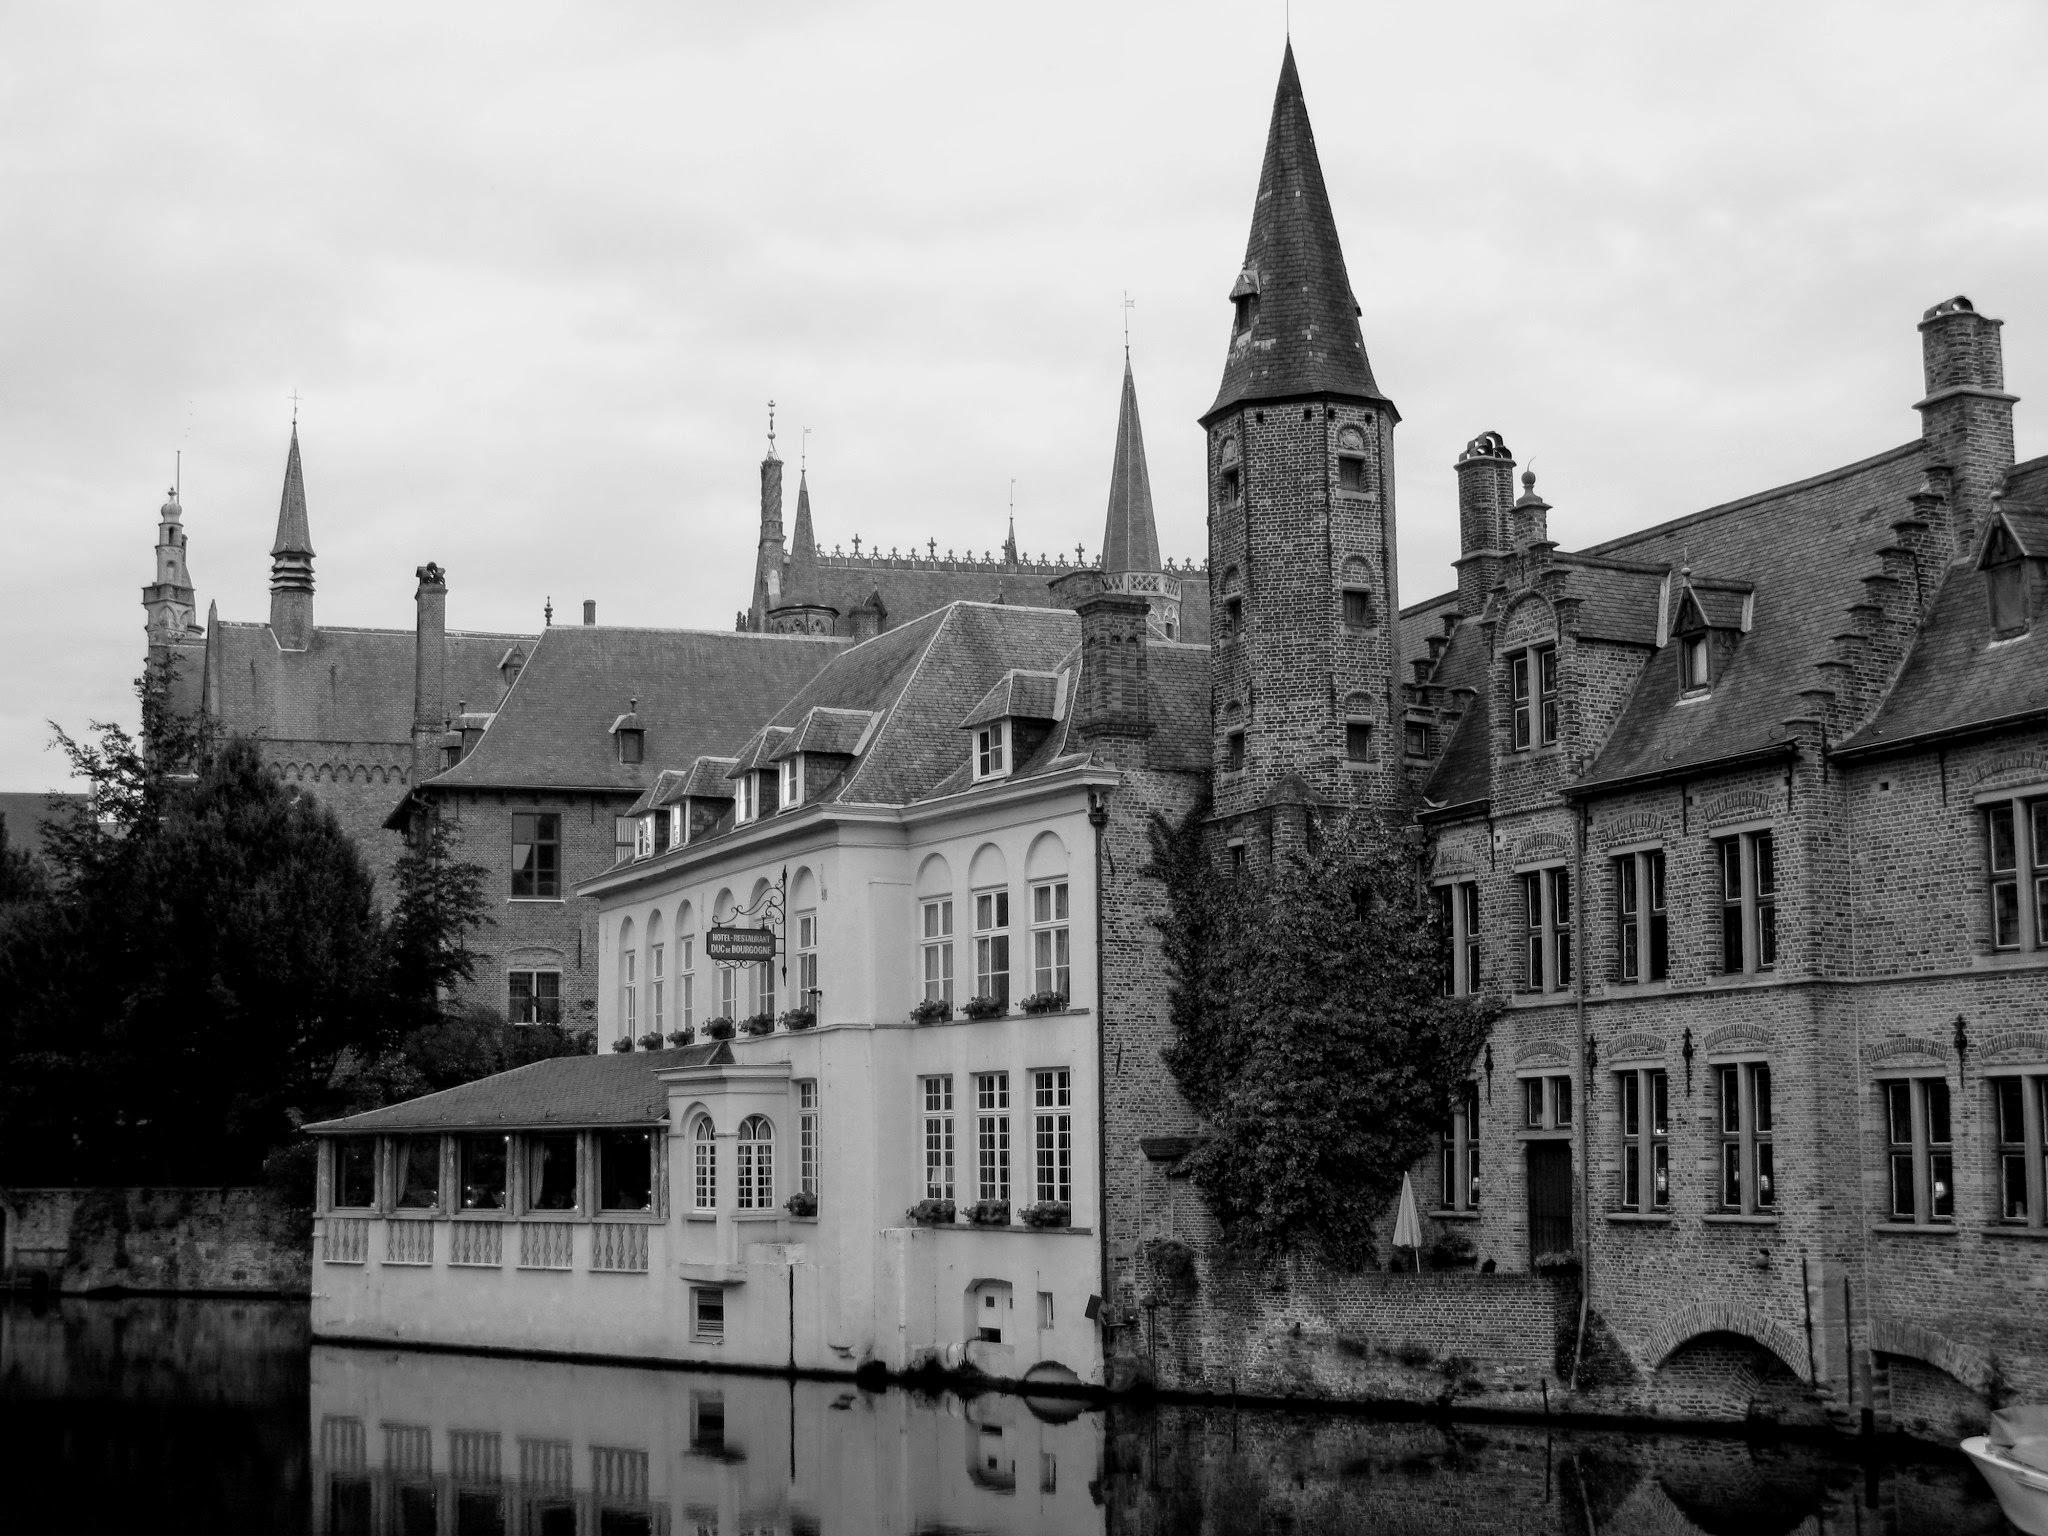 Summer evening in Bruges, Belgium by Ela Gajowska